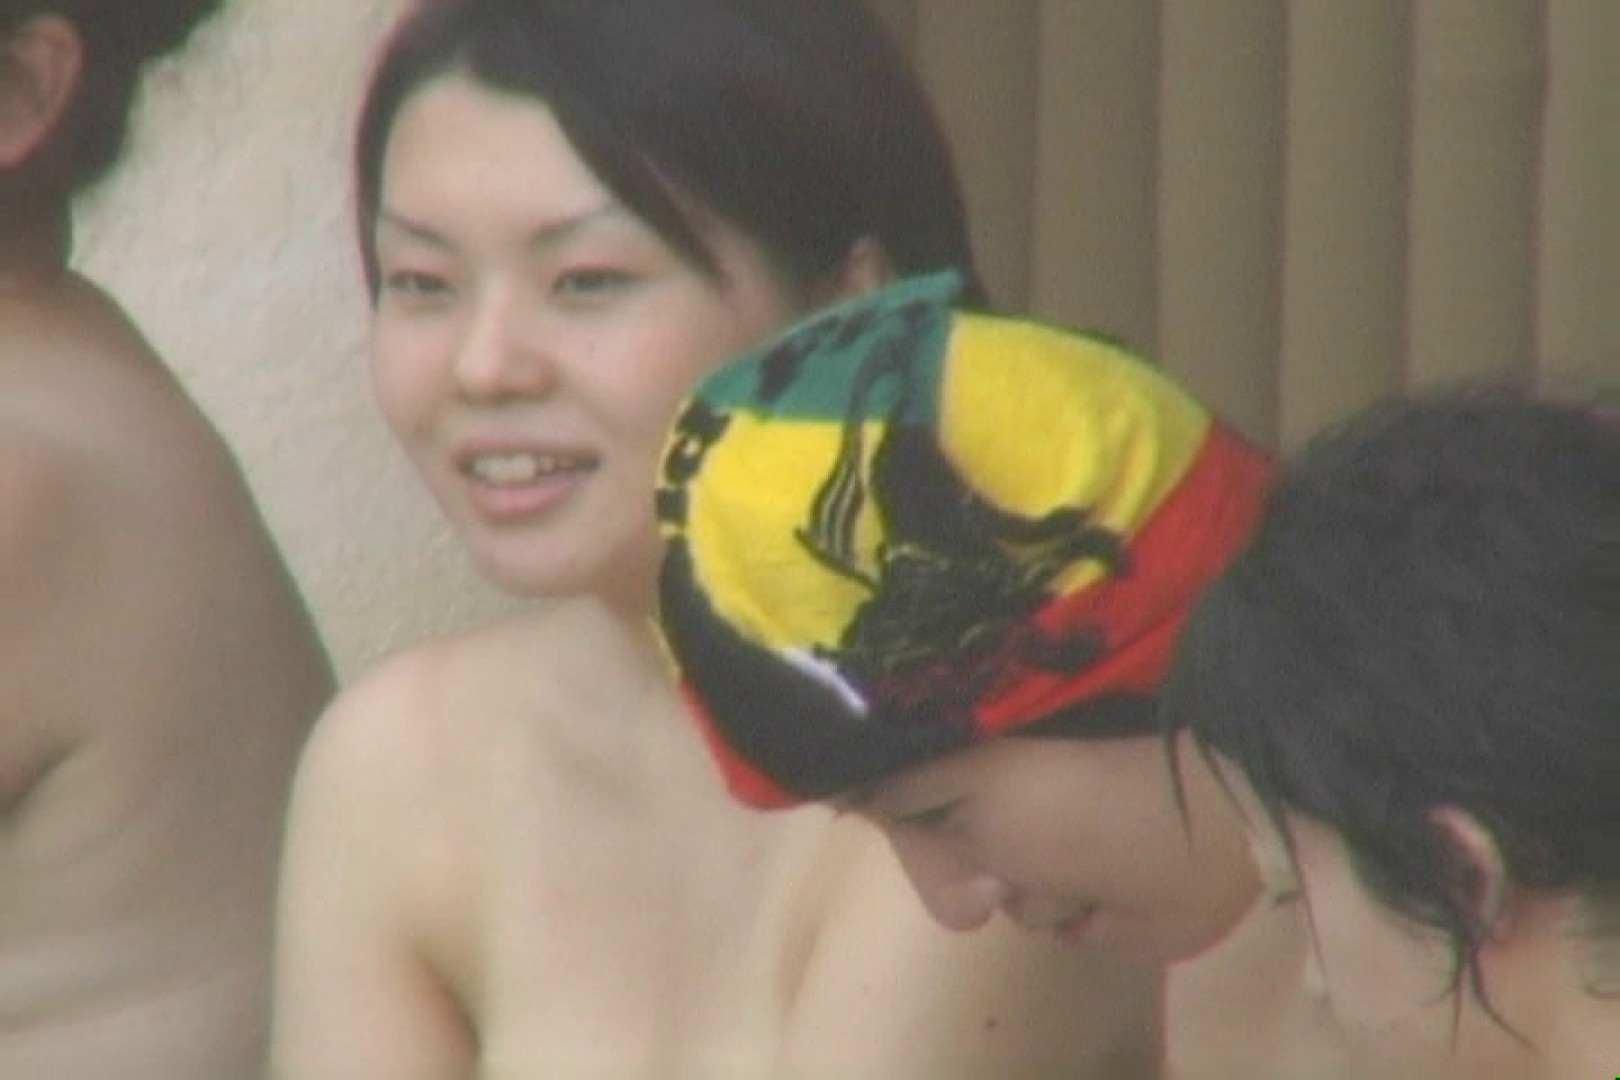 Aquaな露天風呂Vol.61【VIP限定】 OLセックス   盗撮  72画像 31